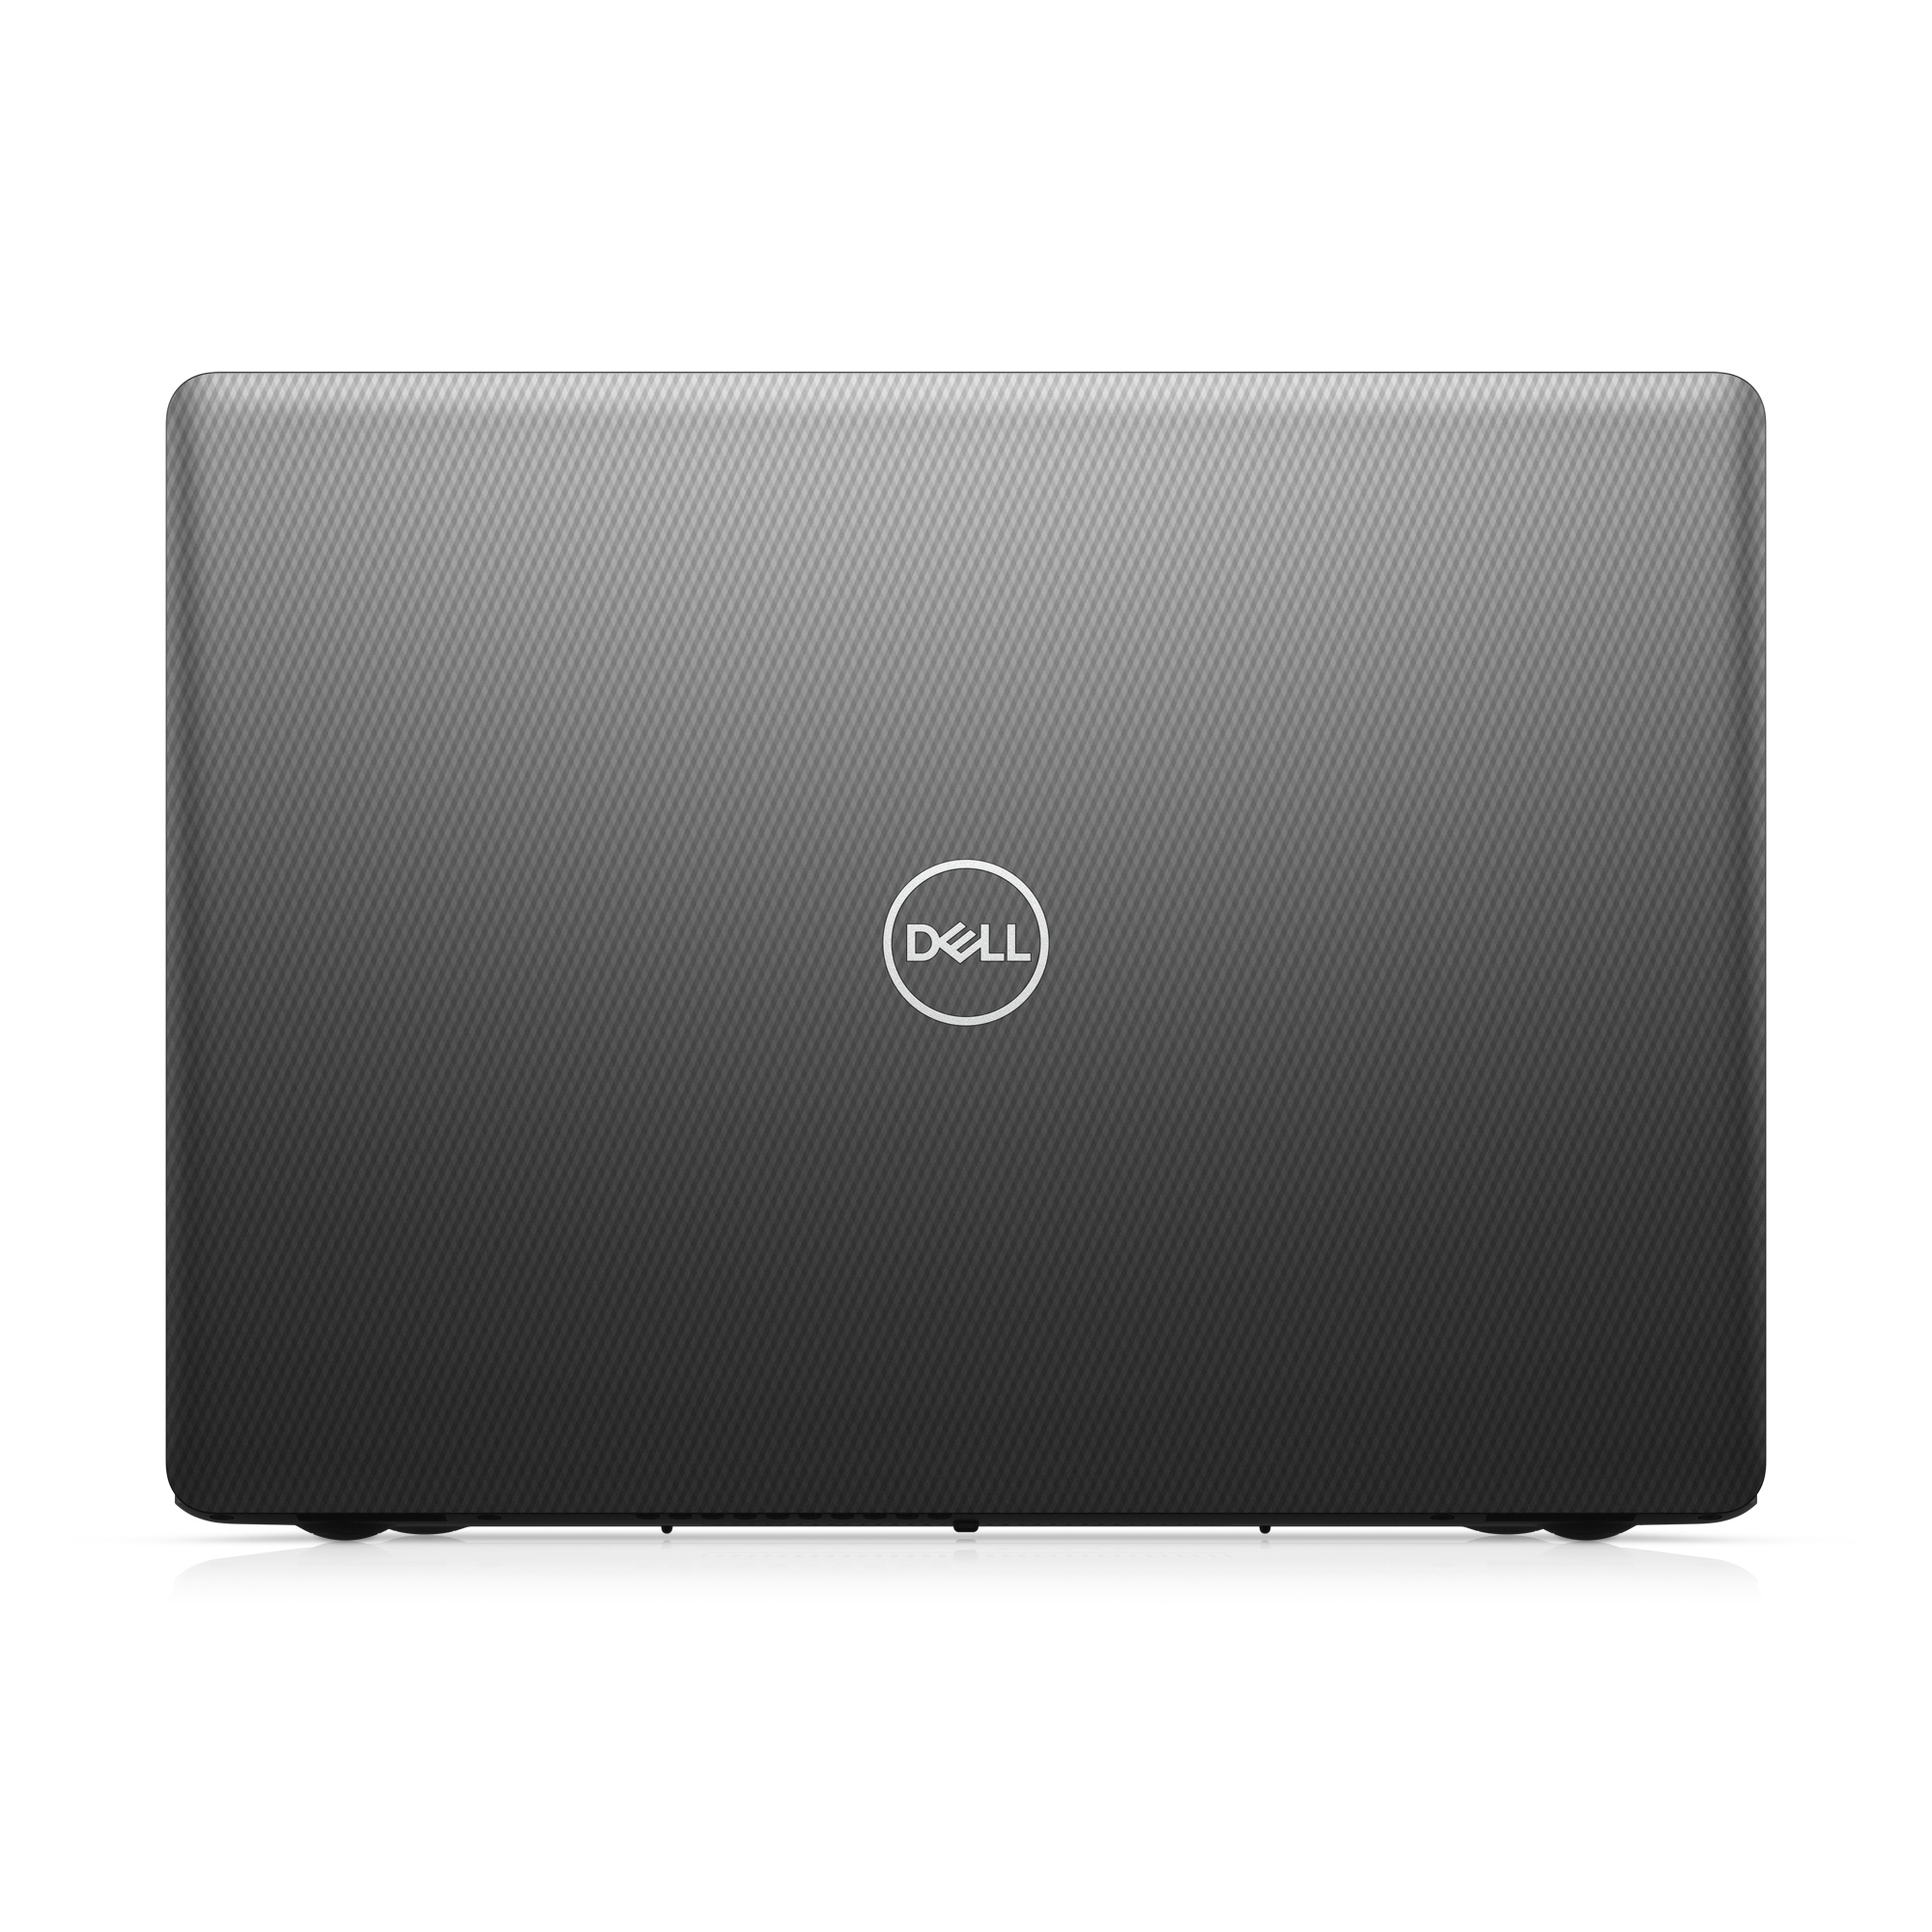 Dell Inspiron 14 i3493-3464BLK-PUS